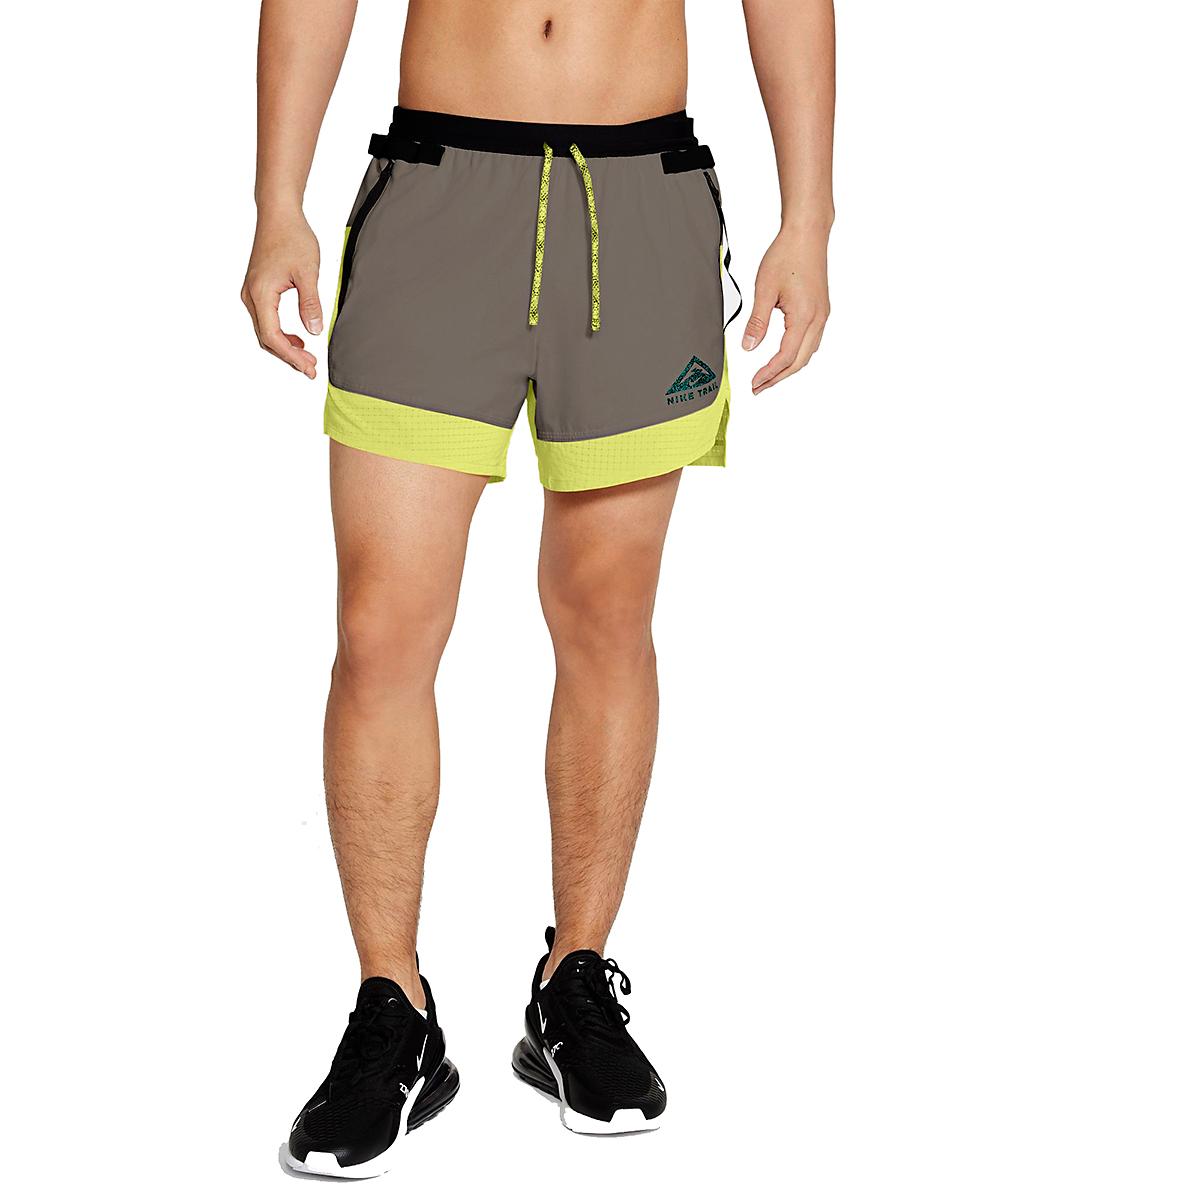 Men's Nike Dri-FIT Flex Stride Trail Shorts - Color: Light Lemon Twist/Moon Fossil/Bright Spruce - Size: S, Light Lemon Twist/Moon Fossil/Bright Spruce, large, image 1